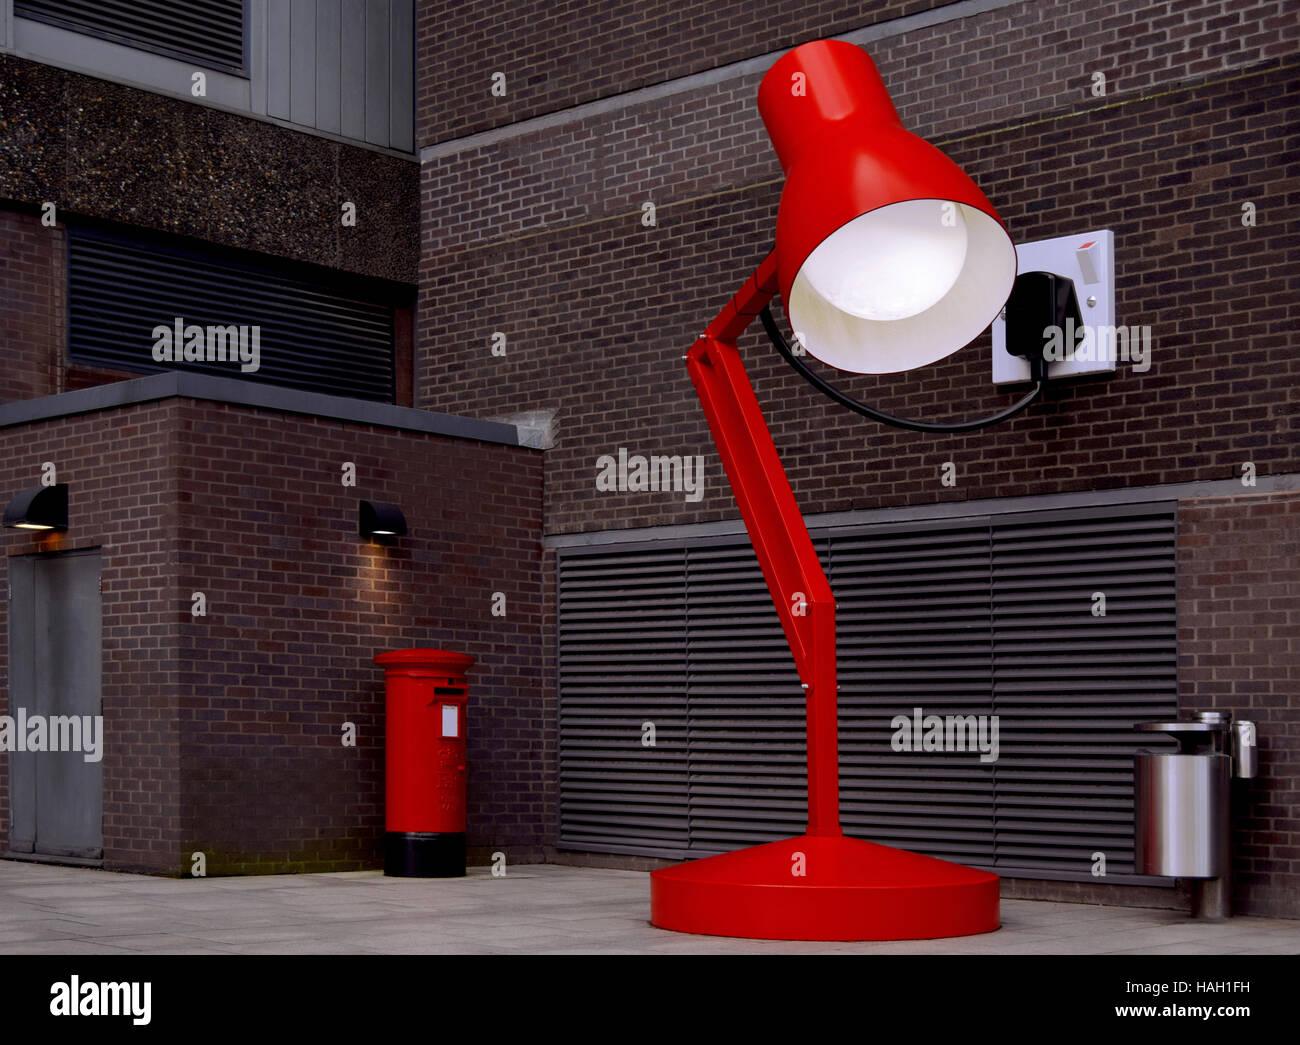 red design previous lamp market desk next